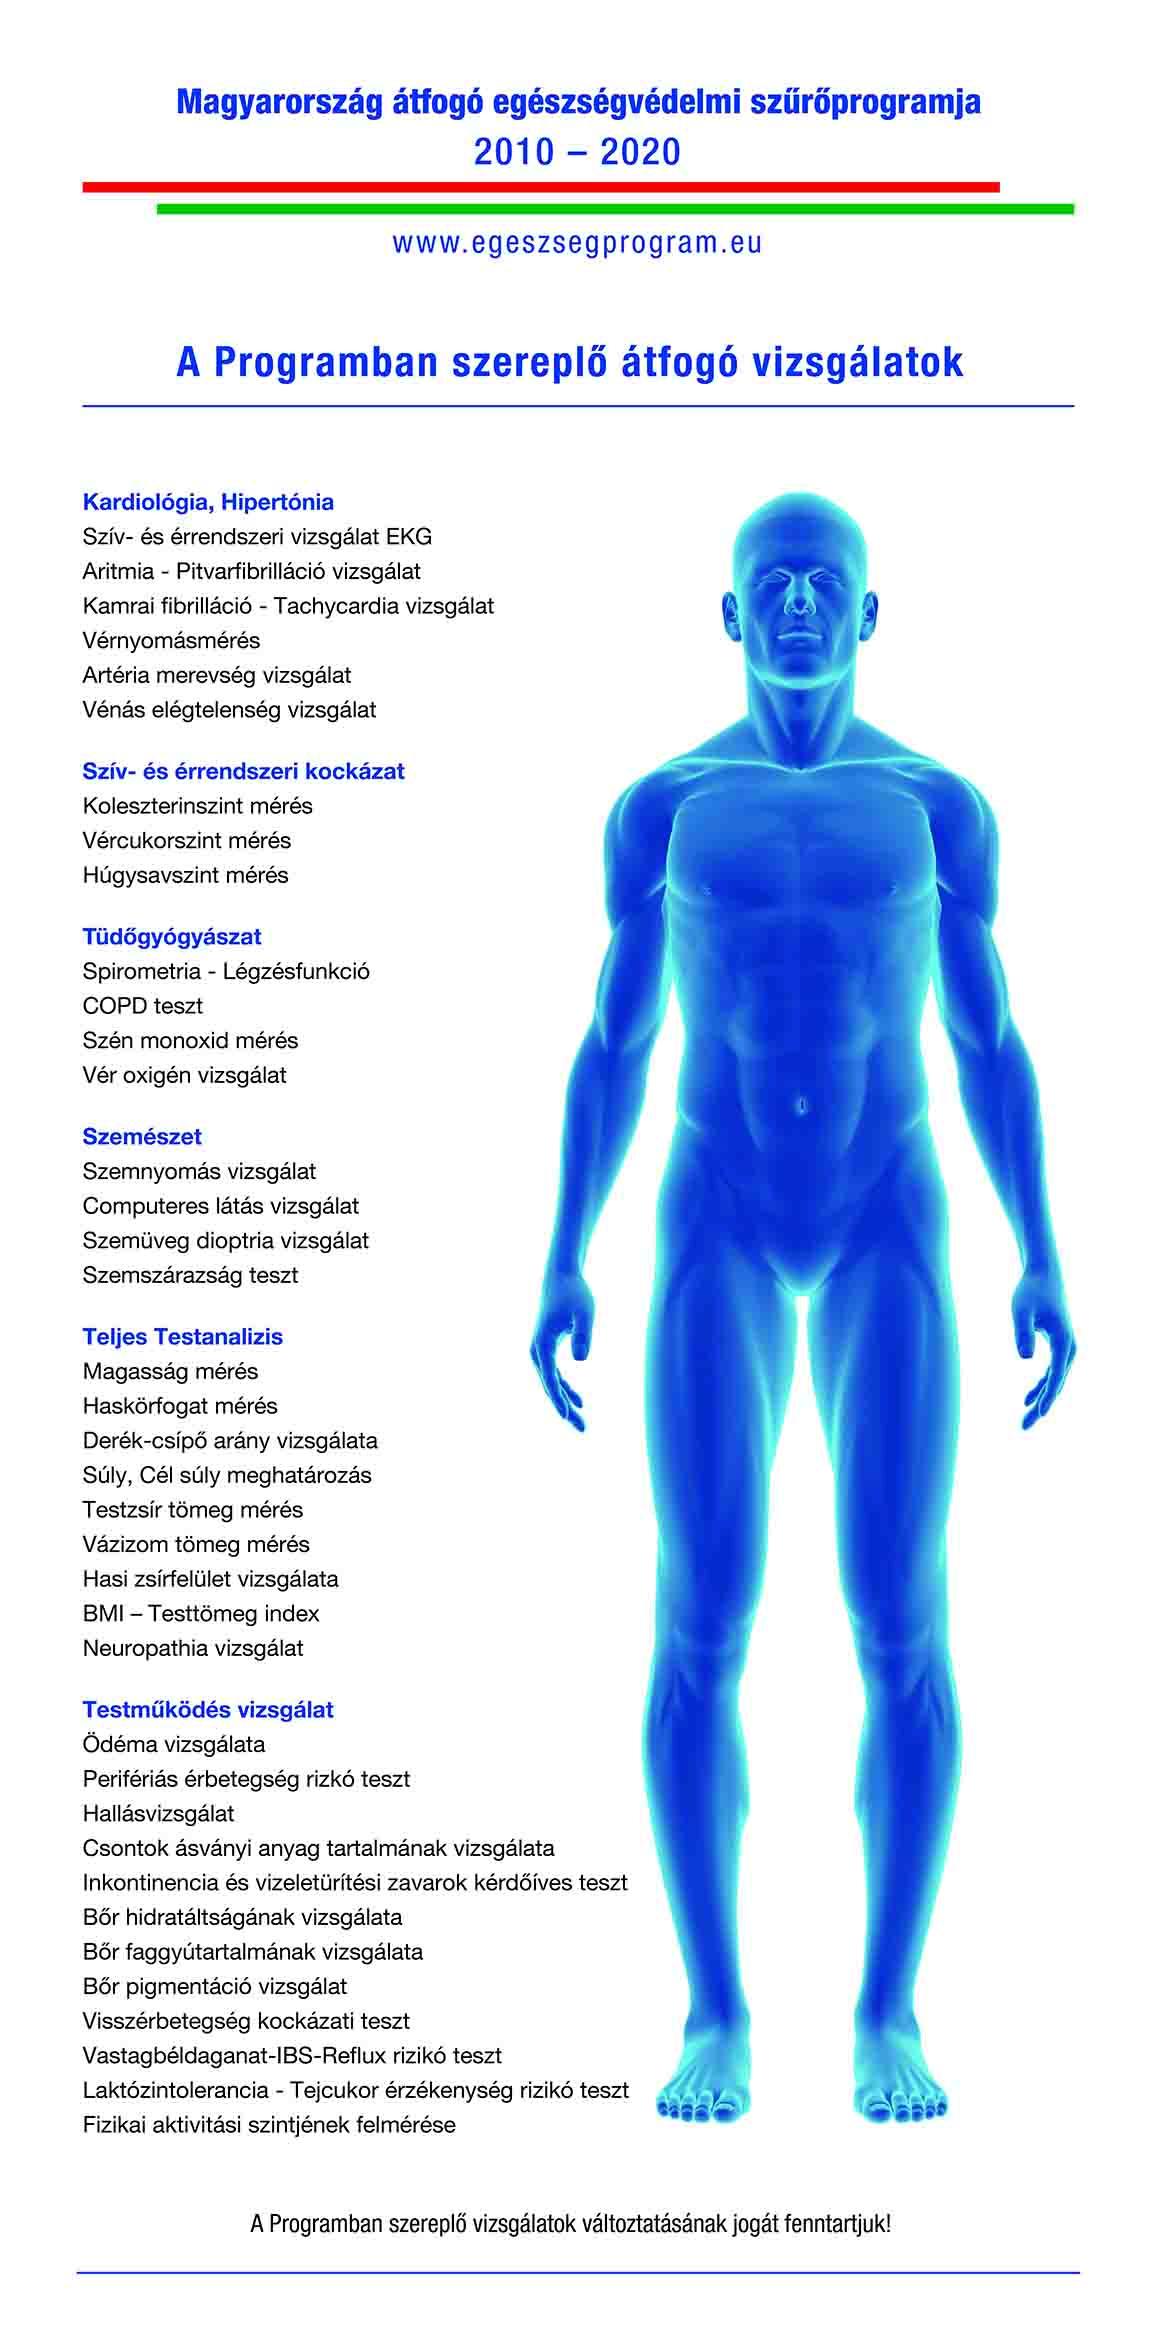 hypothyreosis hipertónia krónikus veseelégtelenség magas vérnyomás